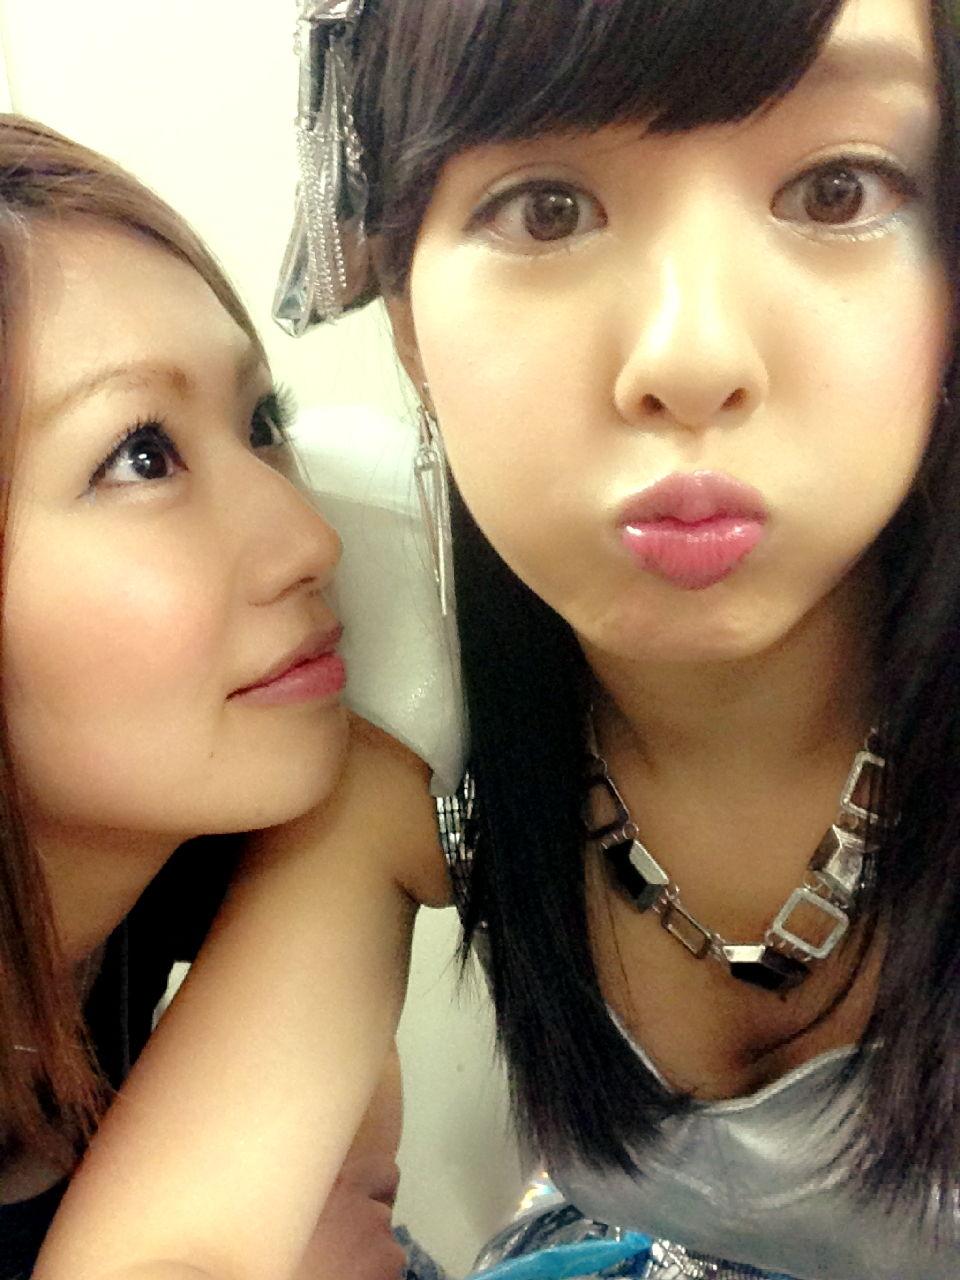 no title 山田菜々がNMB48の美人マネージャーはるぴょんの写真を公開 : 山田菜々をま